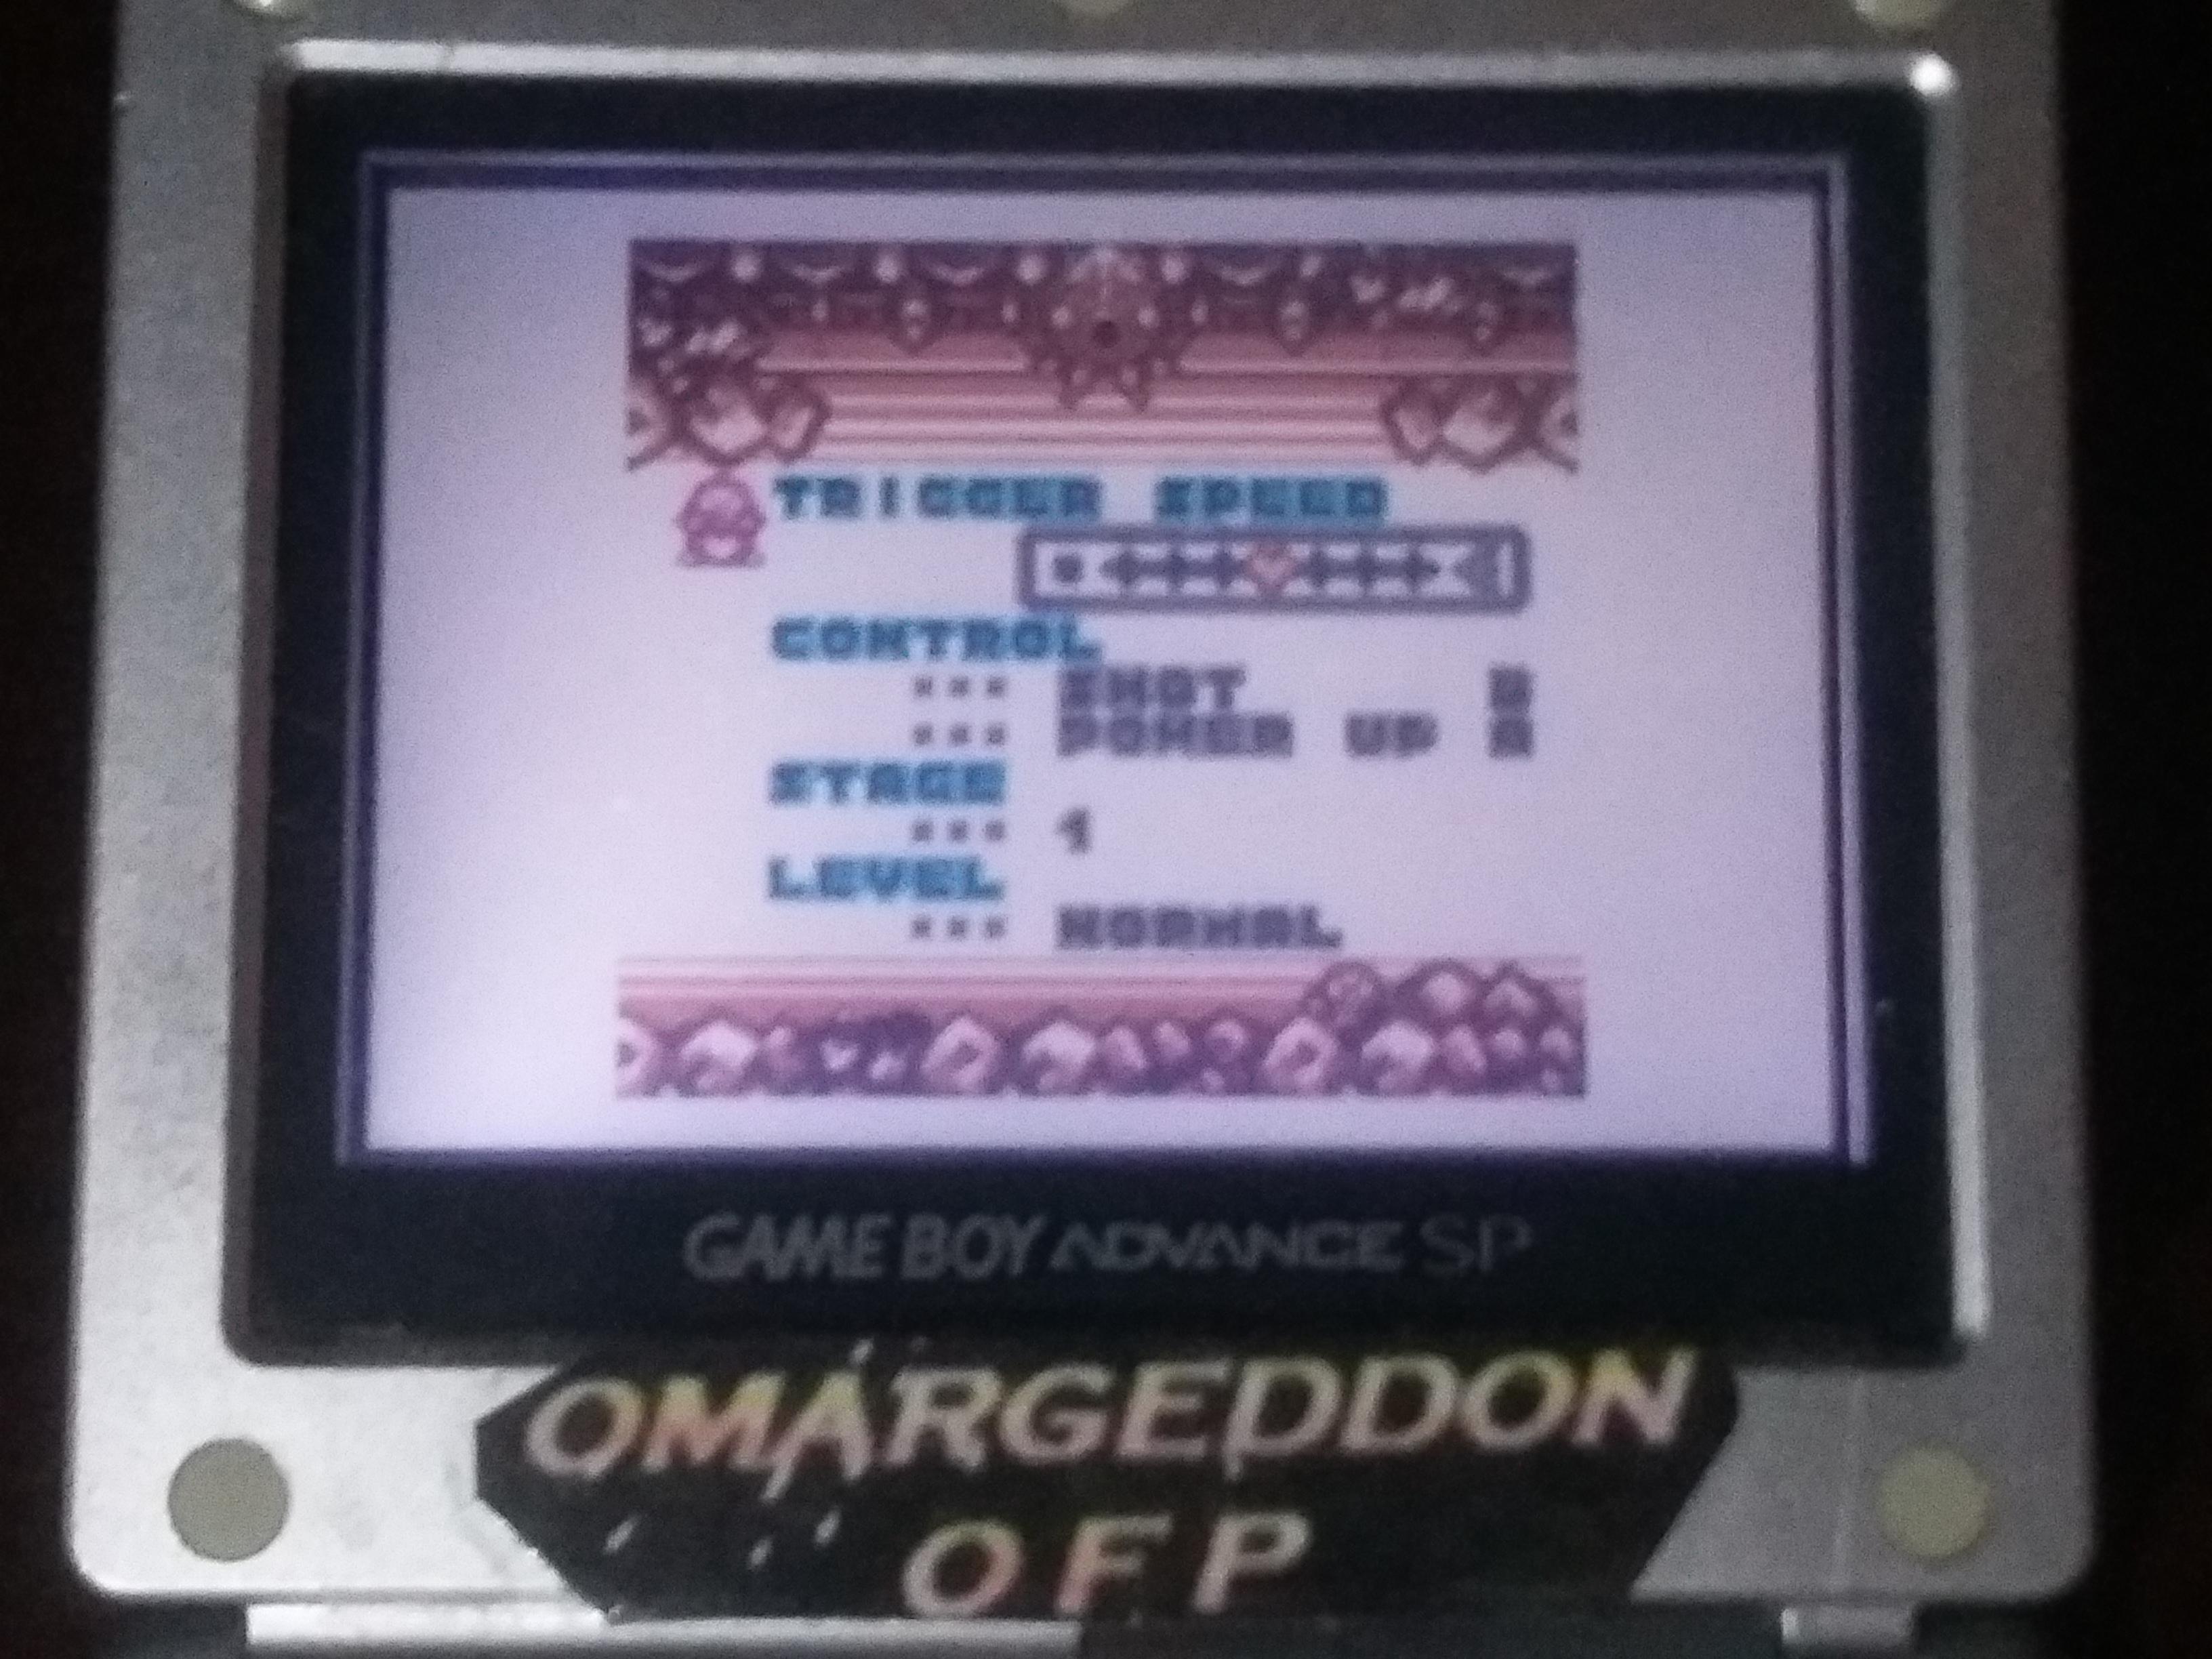 omargeddon: Konami GB Collection Vol. 2: Parodius (Game Boy Color) 44,300 points on 2018-03-03 14:14:25